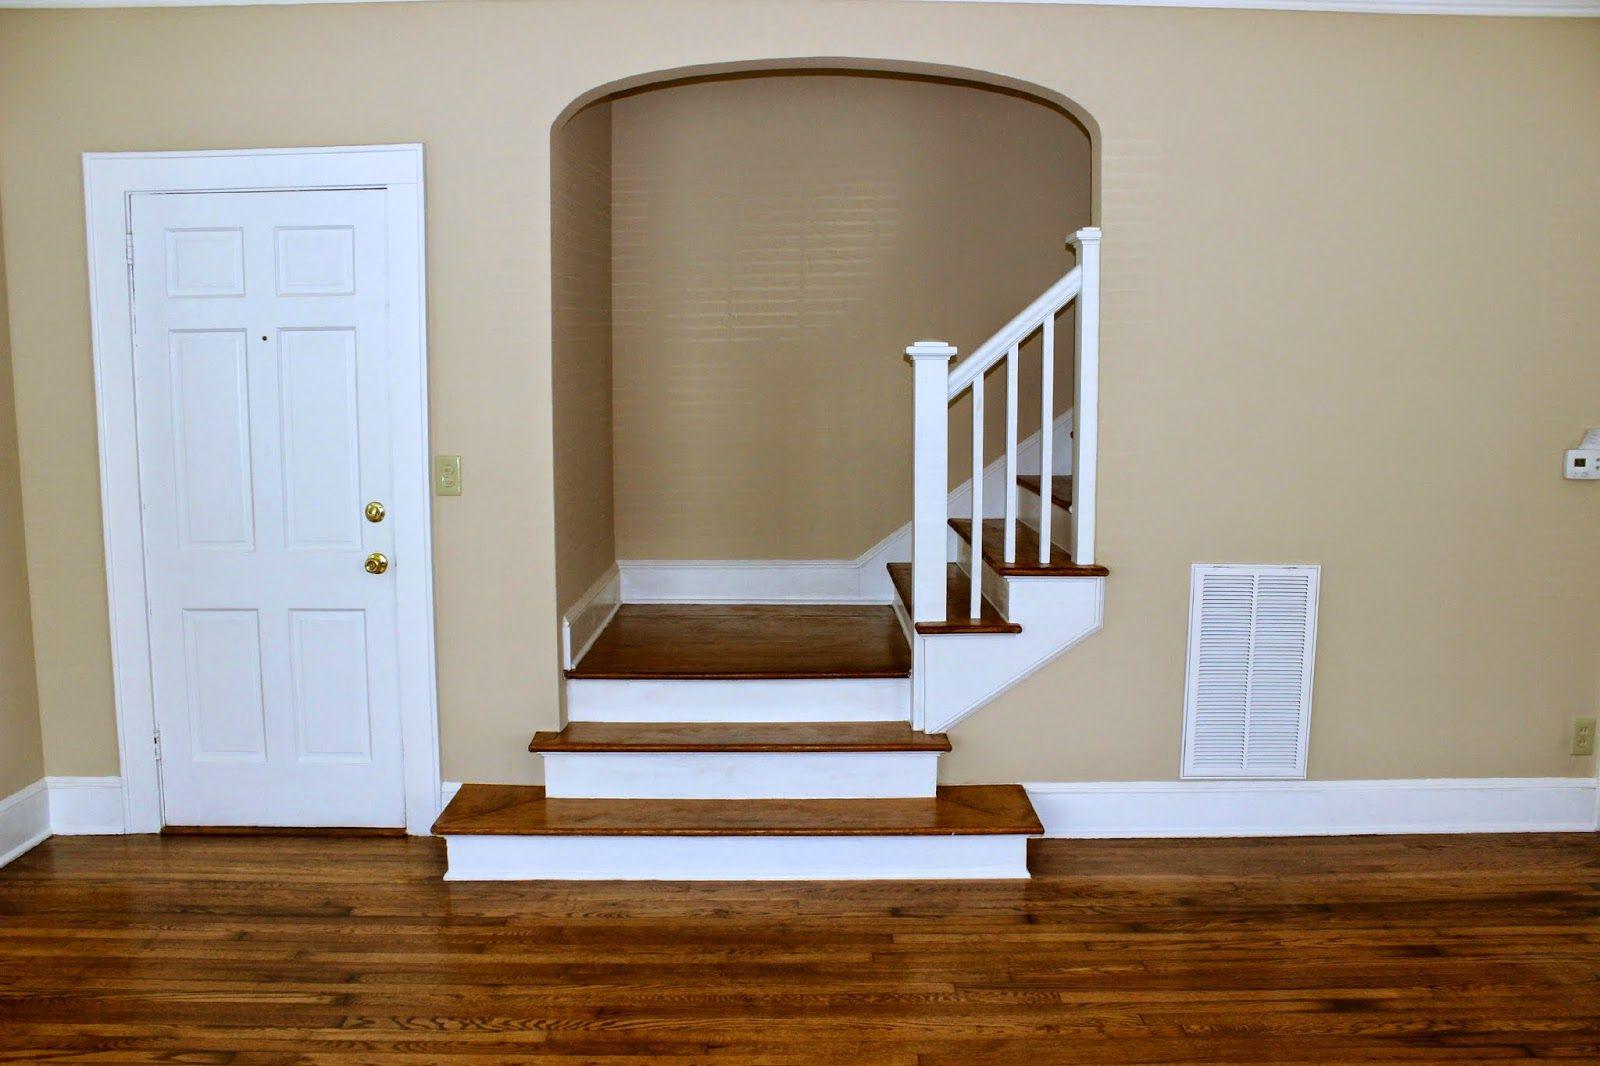 Sherwin williams kilim beige